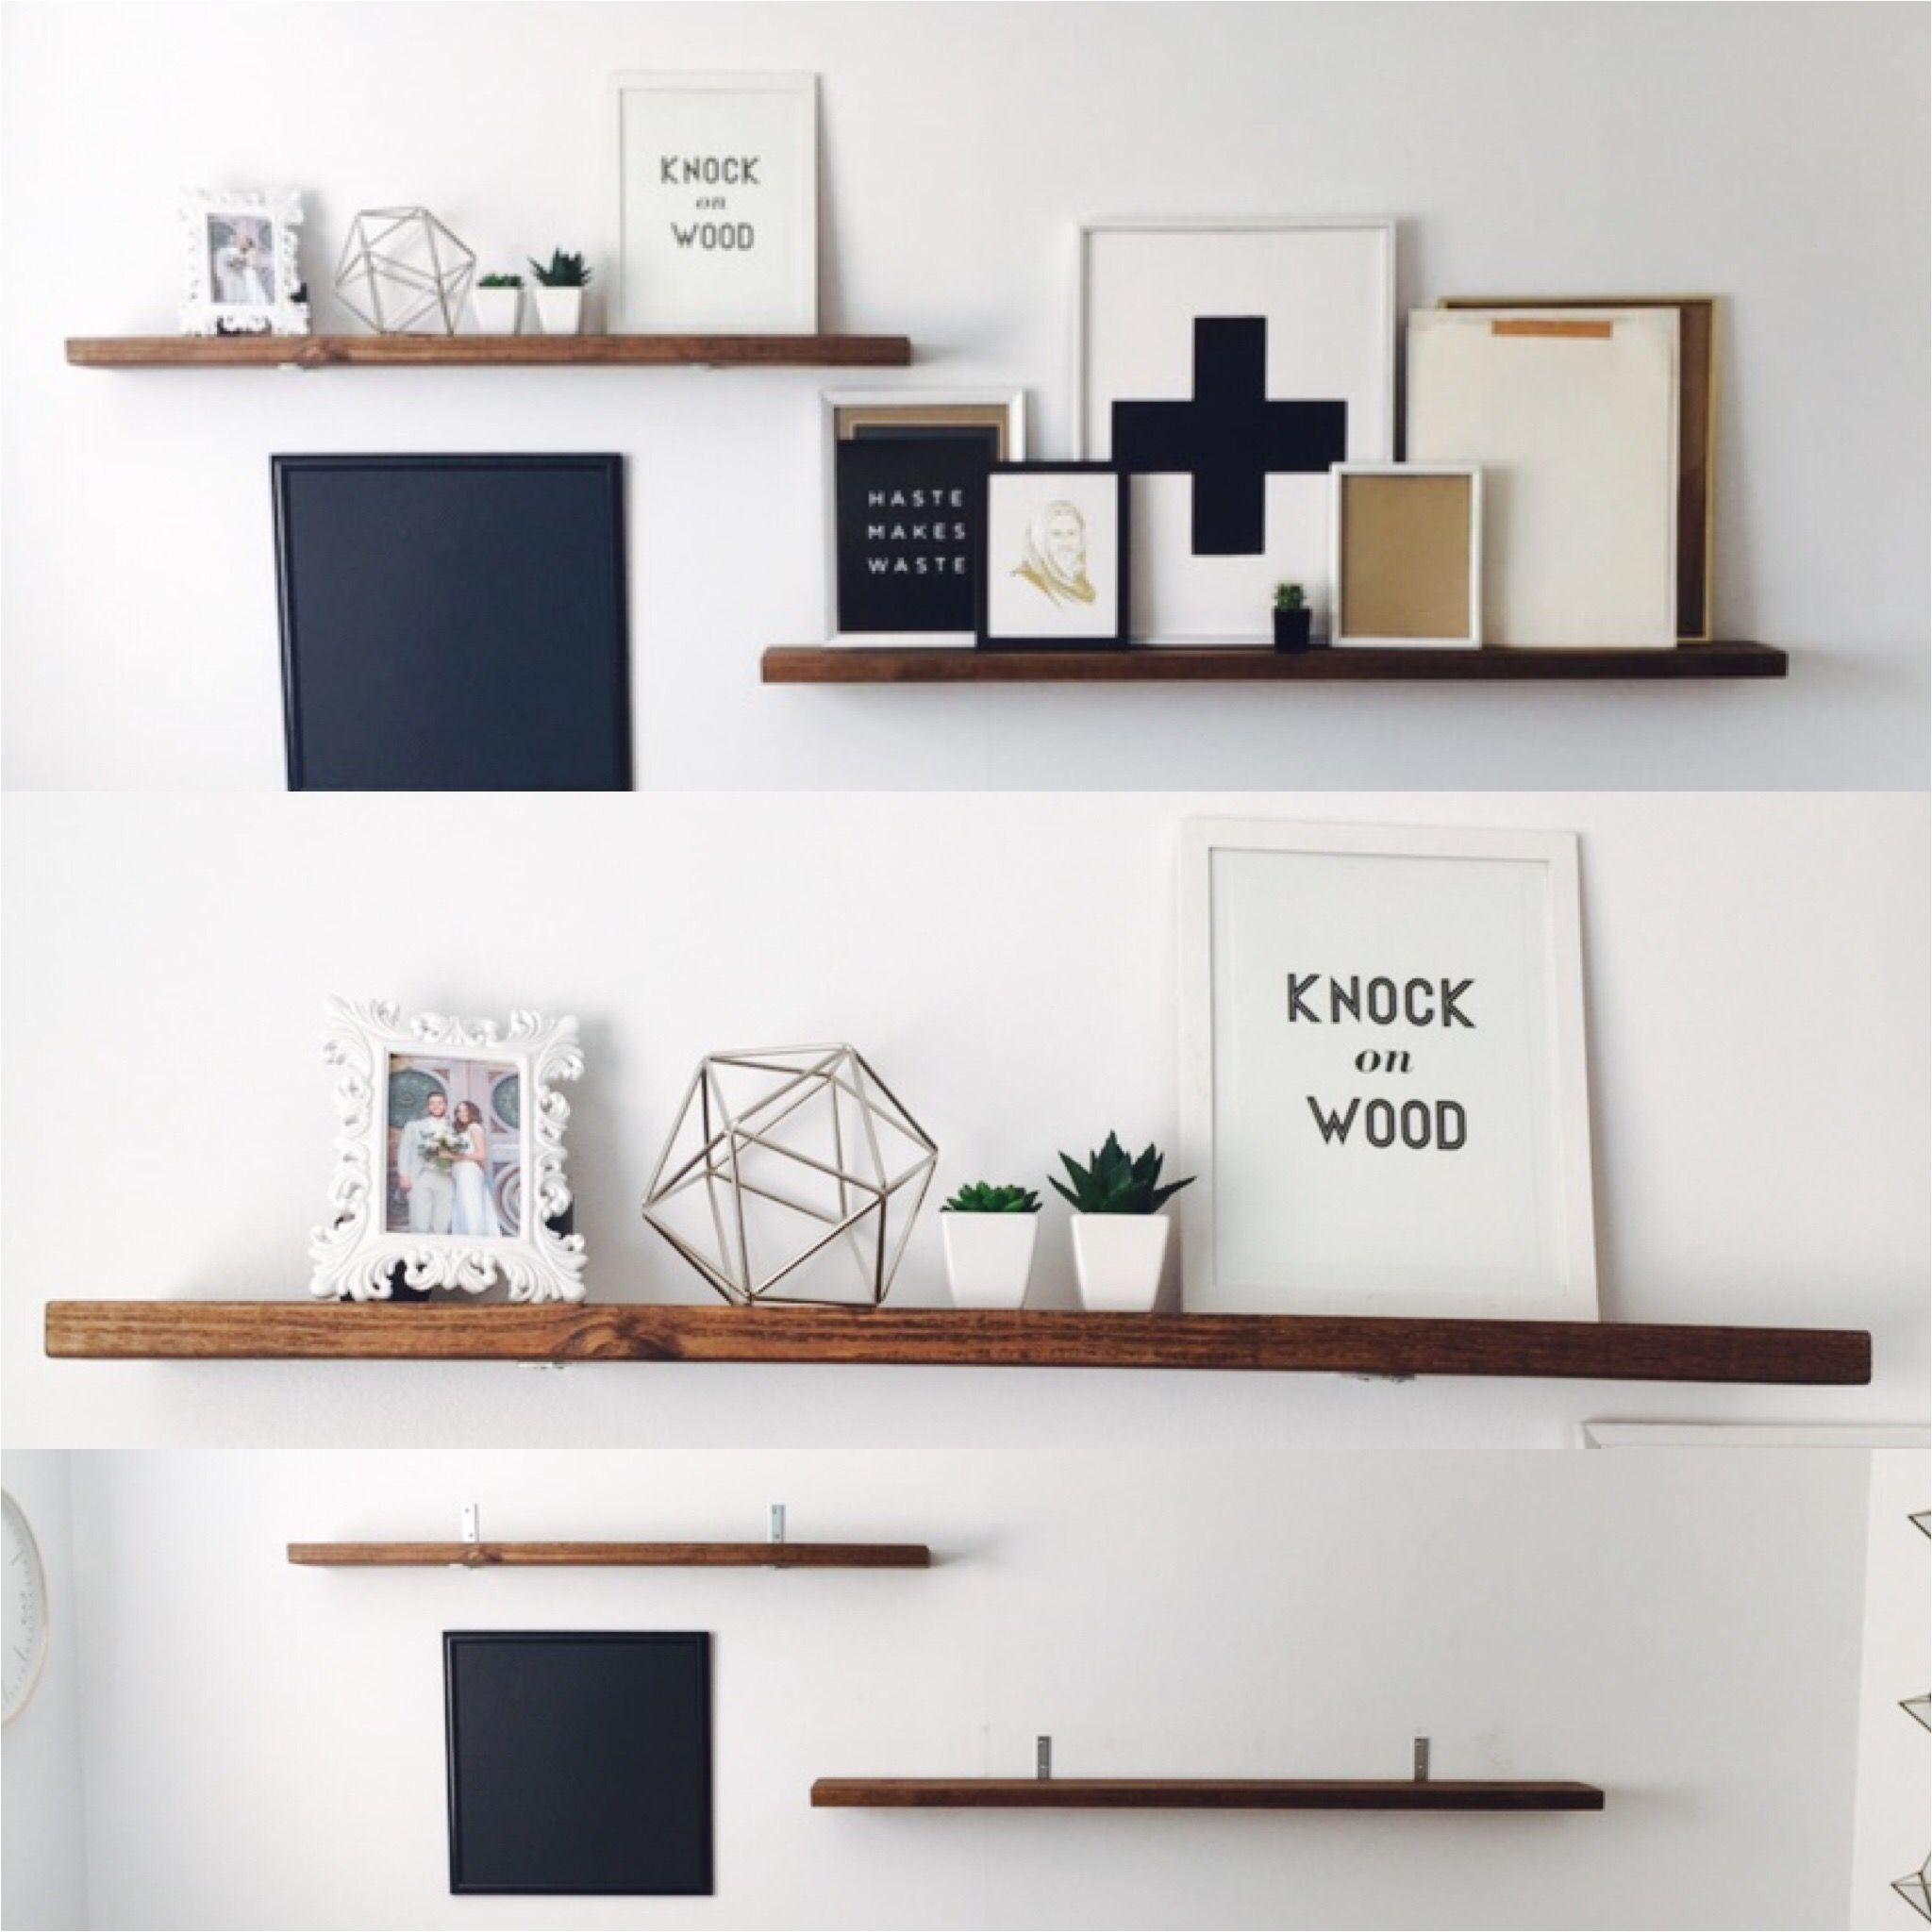 Wooden Floating Shelves Diy Faux Floating Shelves Under 40 Shelves Room Accessories and